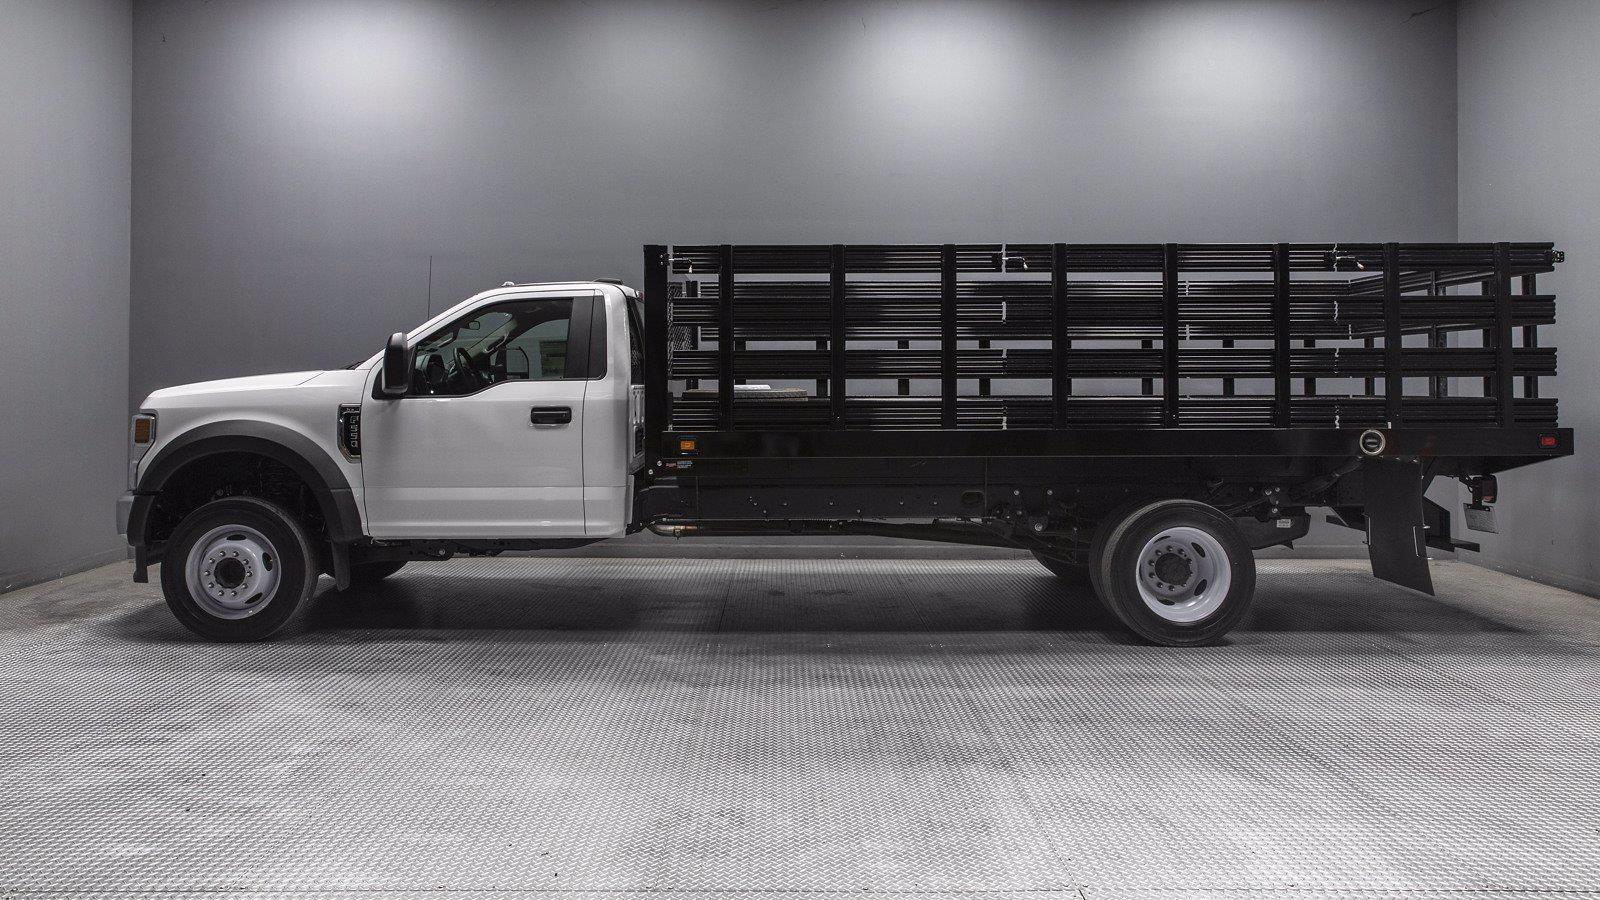 2021 Ford F-550 Regular Cab DRW 4x2, Knapheide Stake Bed #212320 - photo 1